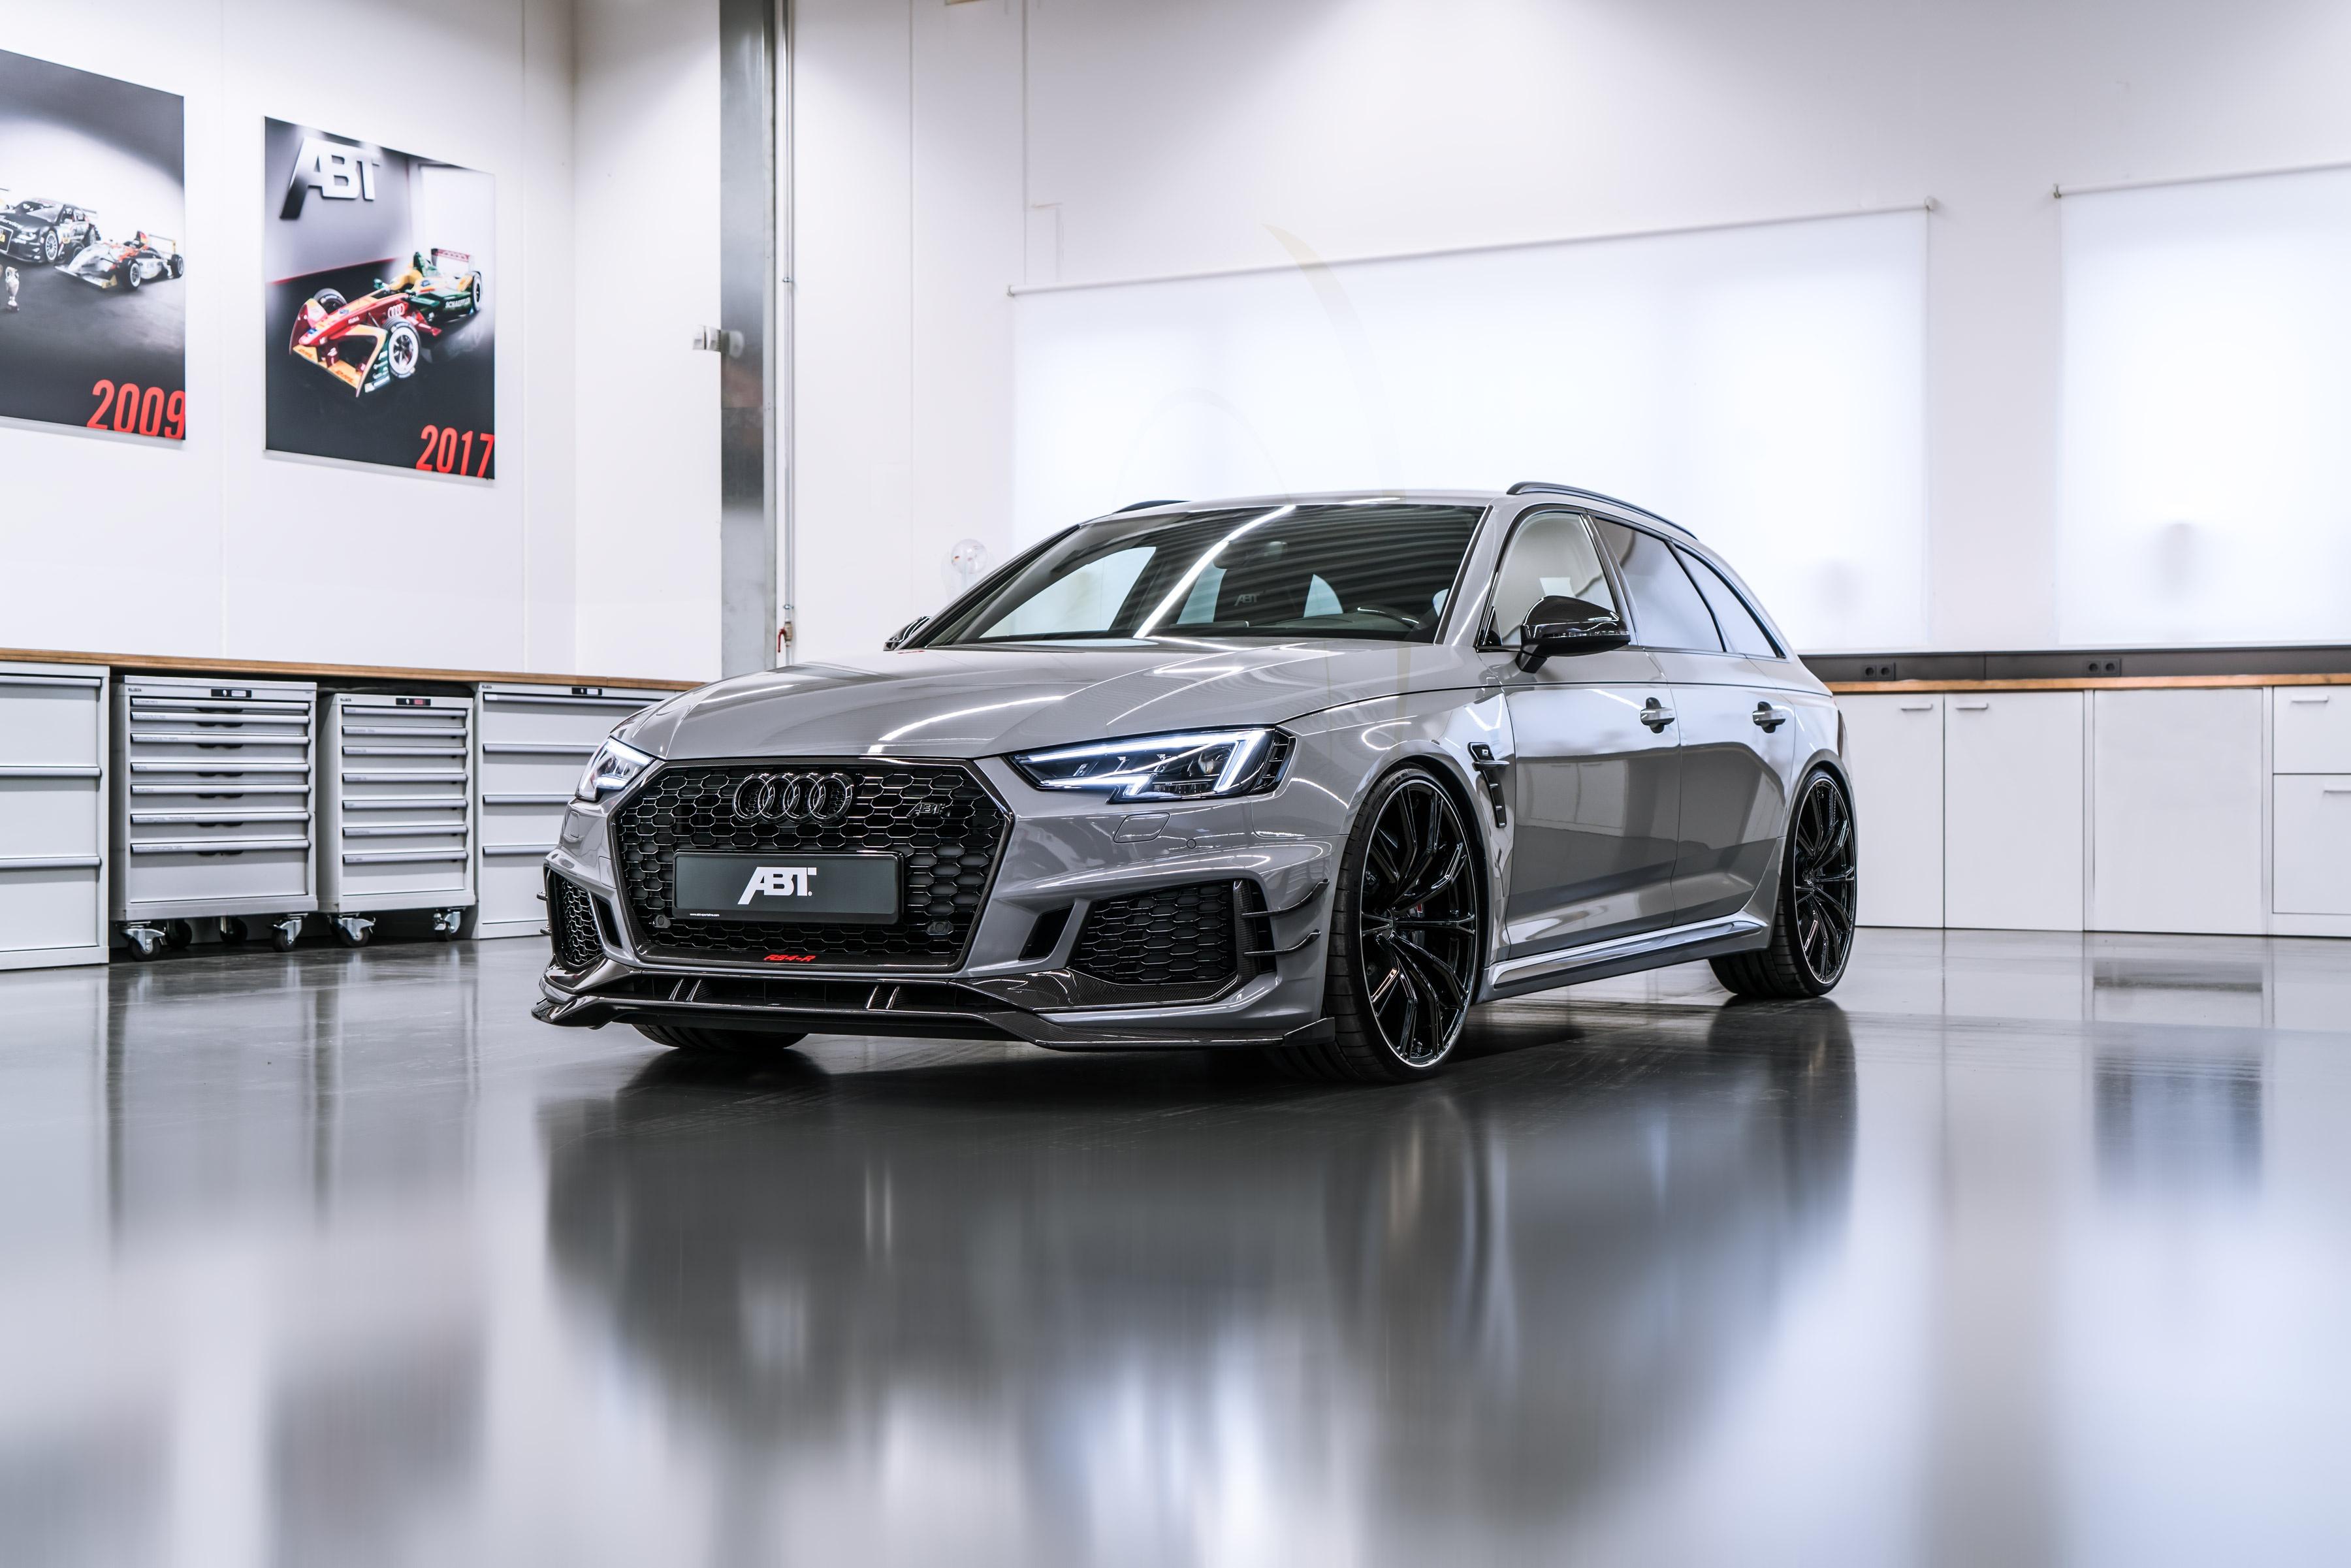 Wallpaper Car Abt Audi Rs4 Reflection 3600x2401 Obseek